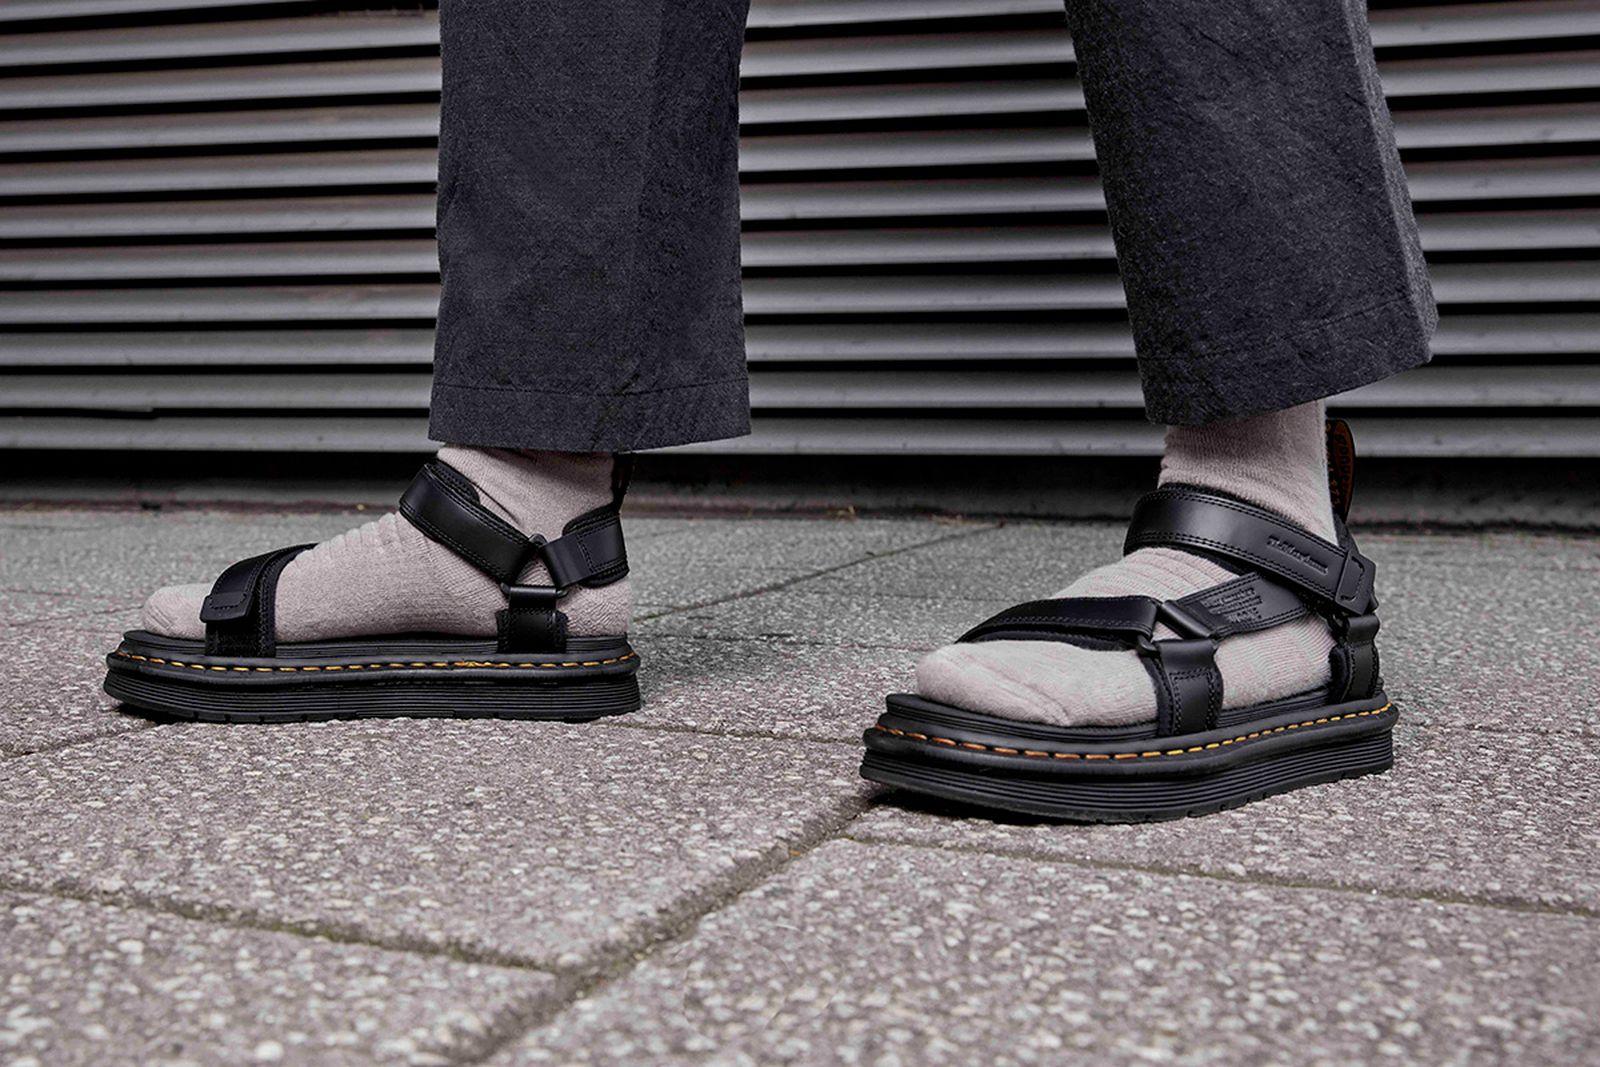 dr-martens-suicoke-sandals-release-date-price-mood-03